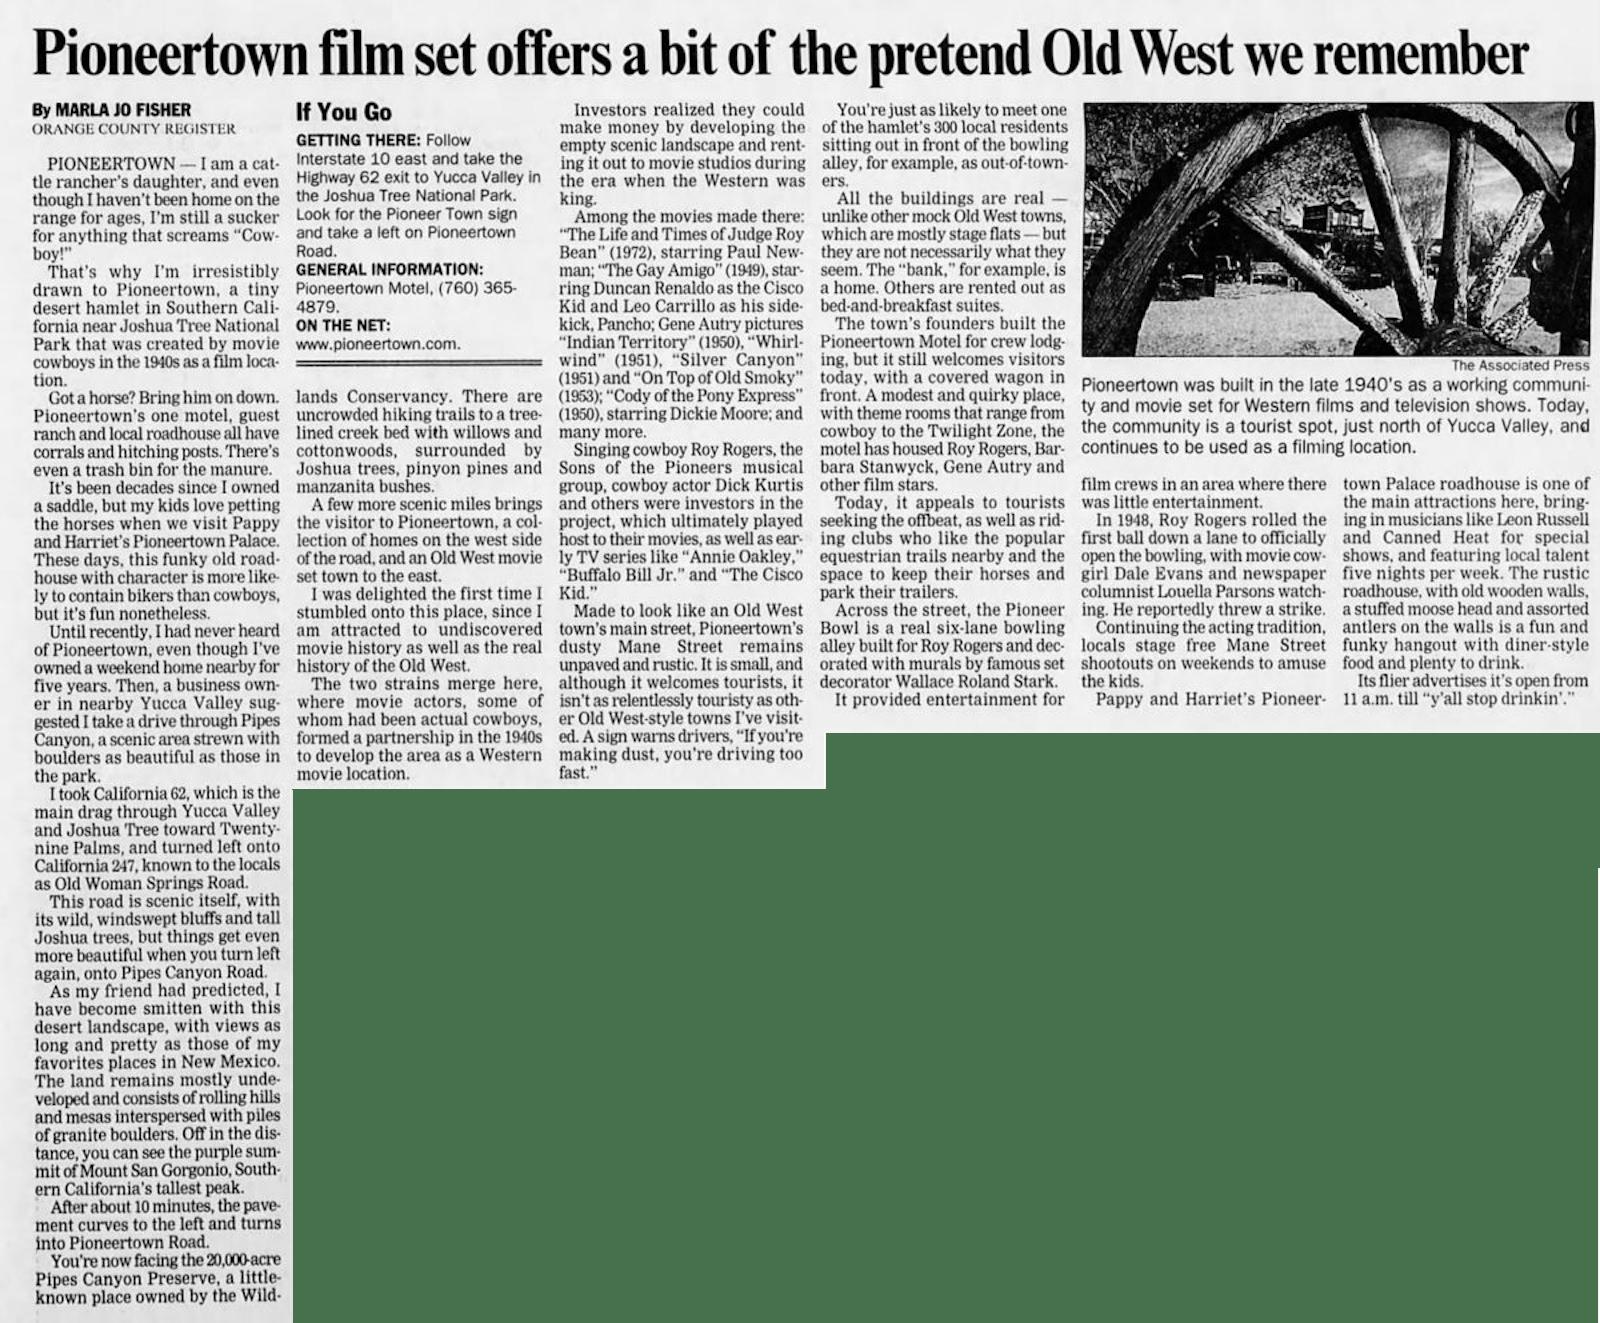 PIoneertown film set - Mar. 13, 2005 - Santa Cruz Sentinel article clipping